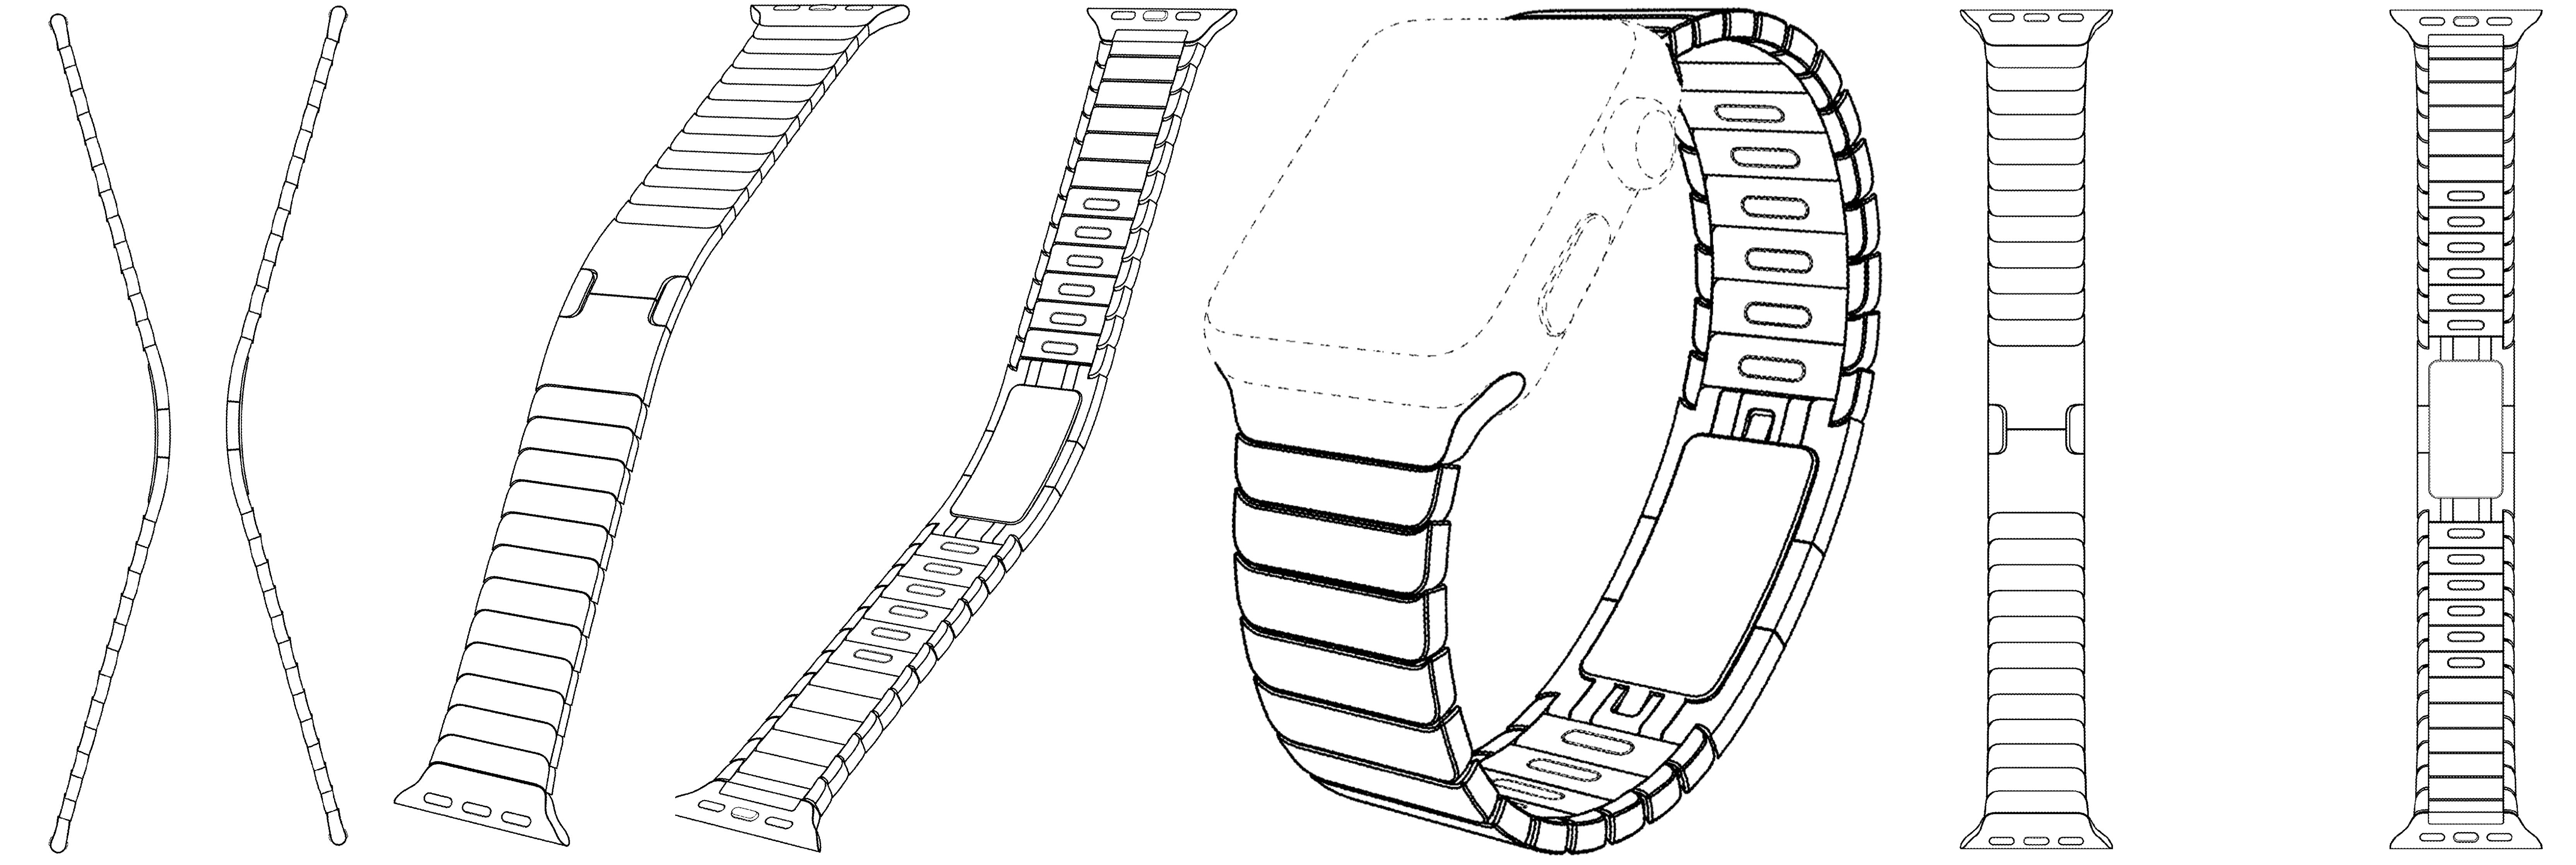 Apple patent Watch Link Bracelet design 001